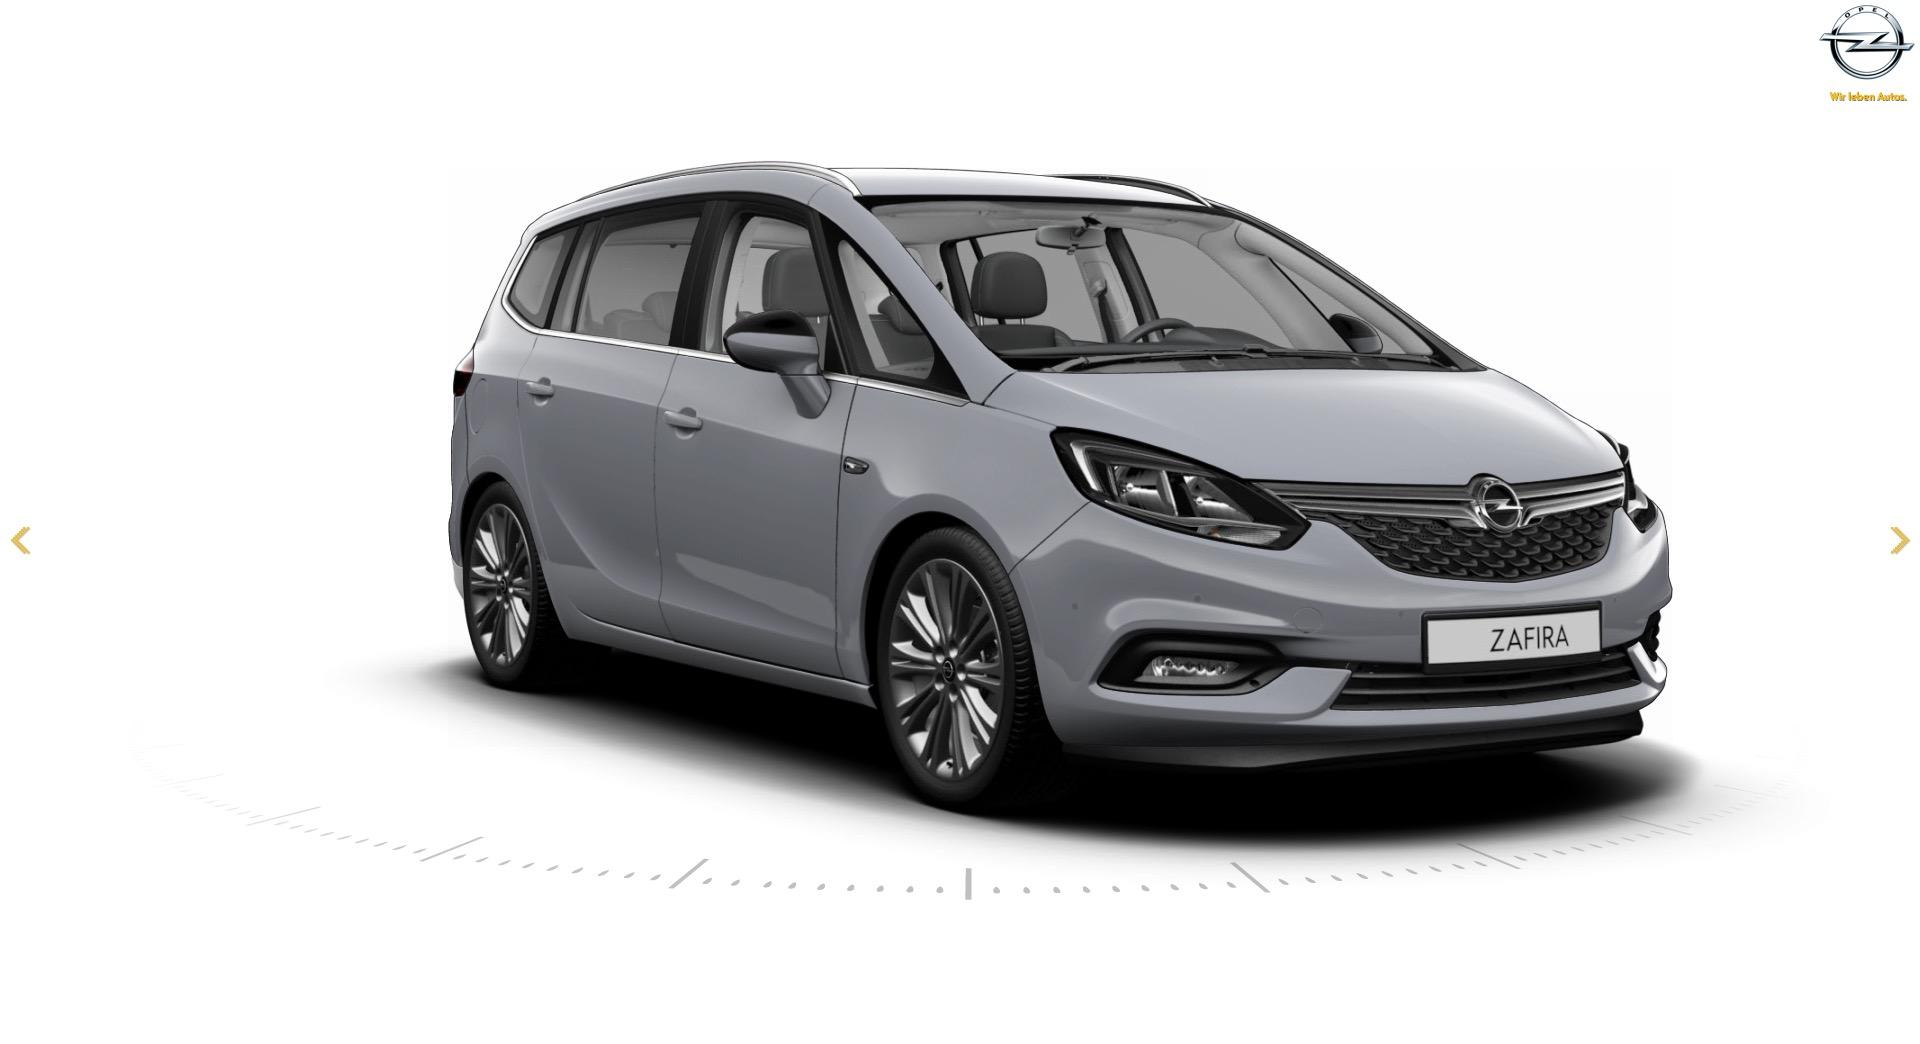 Opel Zafira C Restyling 2016 - now Minivan #6